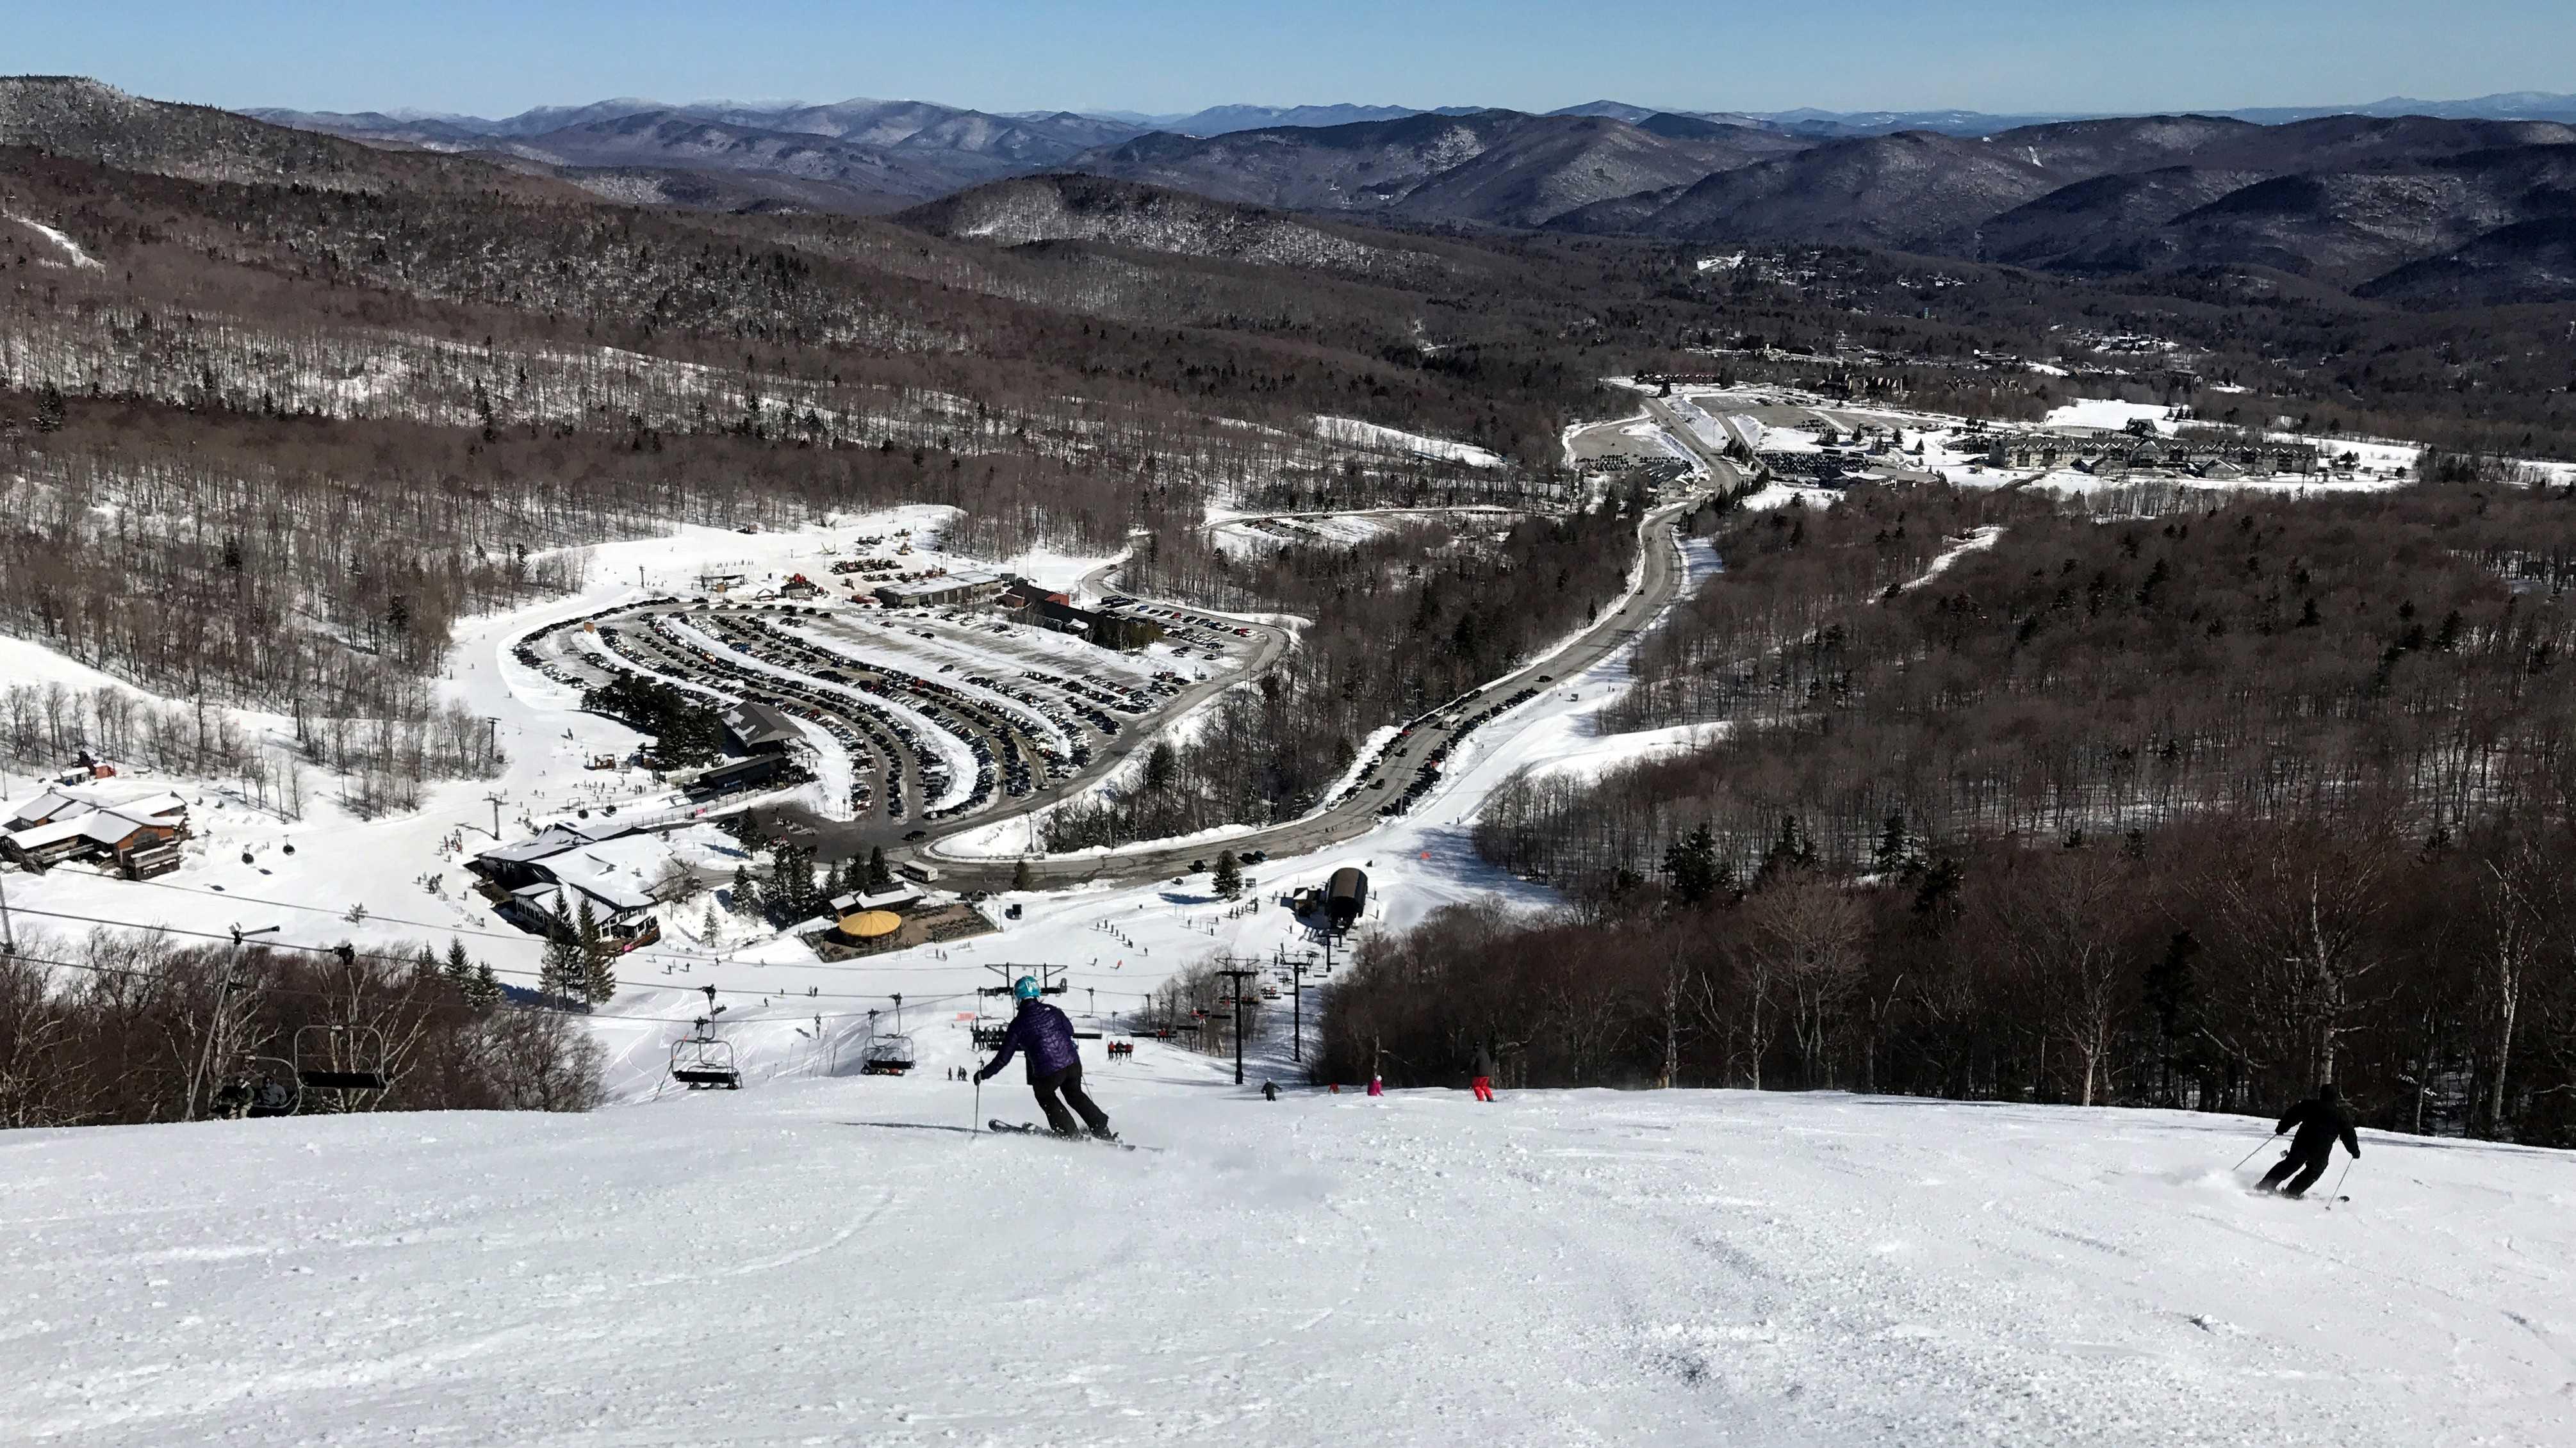 new england's biggest ski resort announces new lifts, tech upgrades